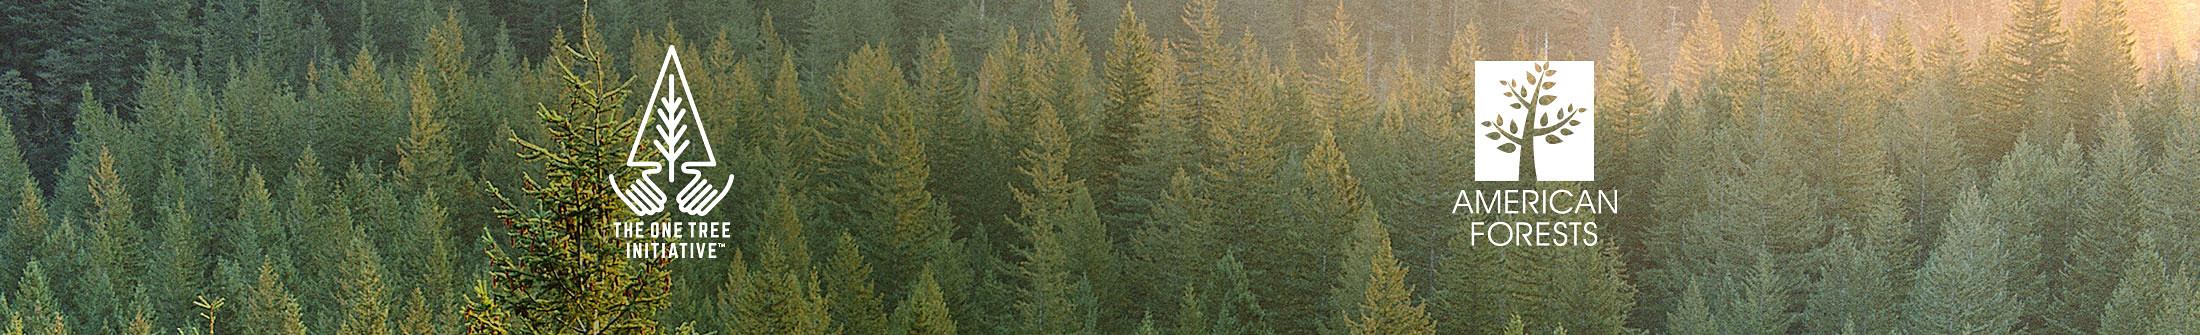 Sunlight shining on Evergreen trees